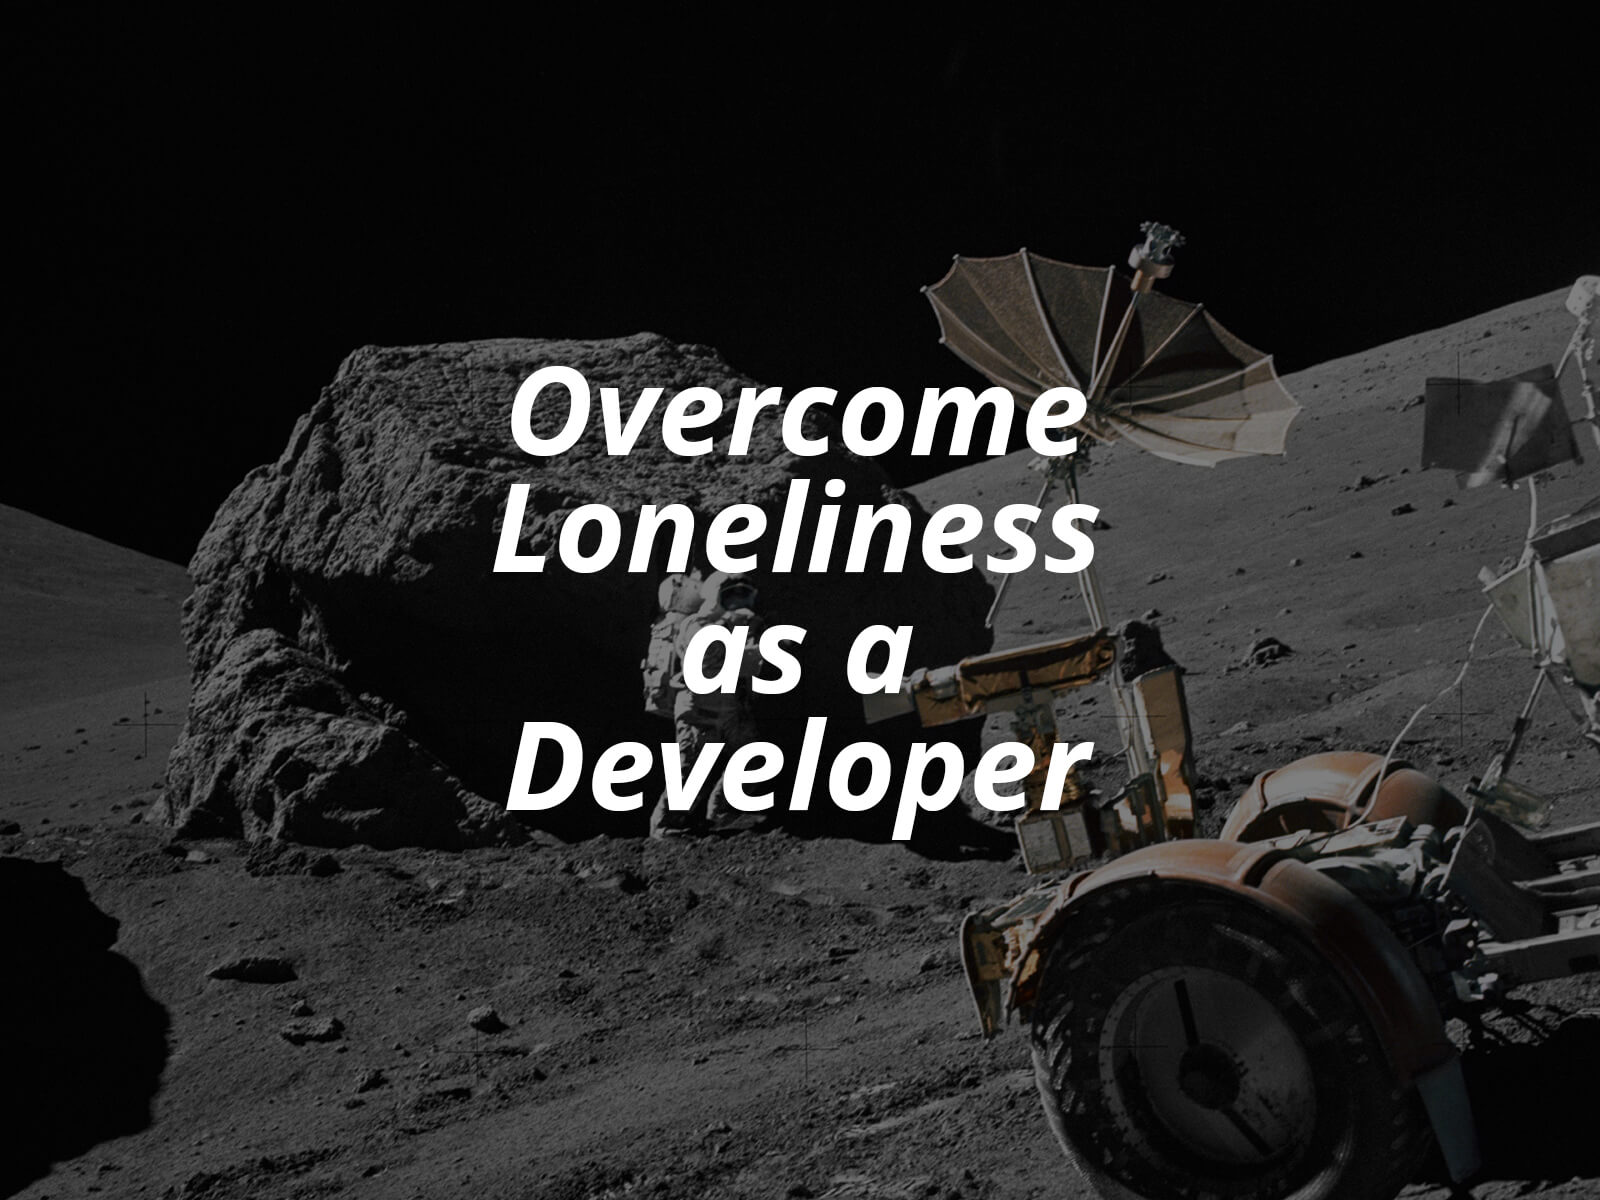 Overcome loneliness as a Developer